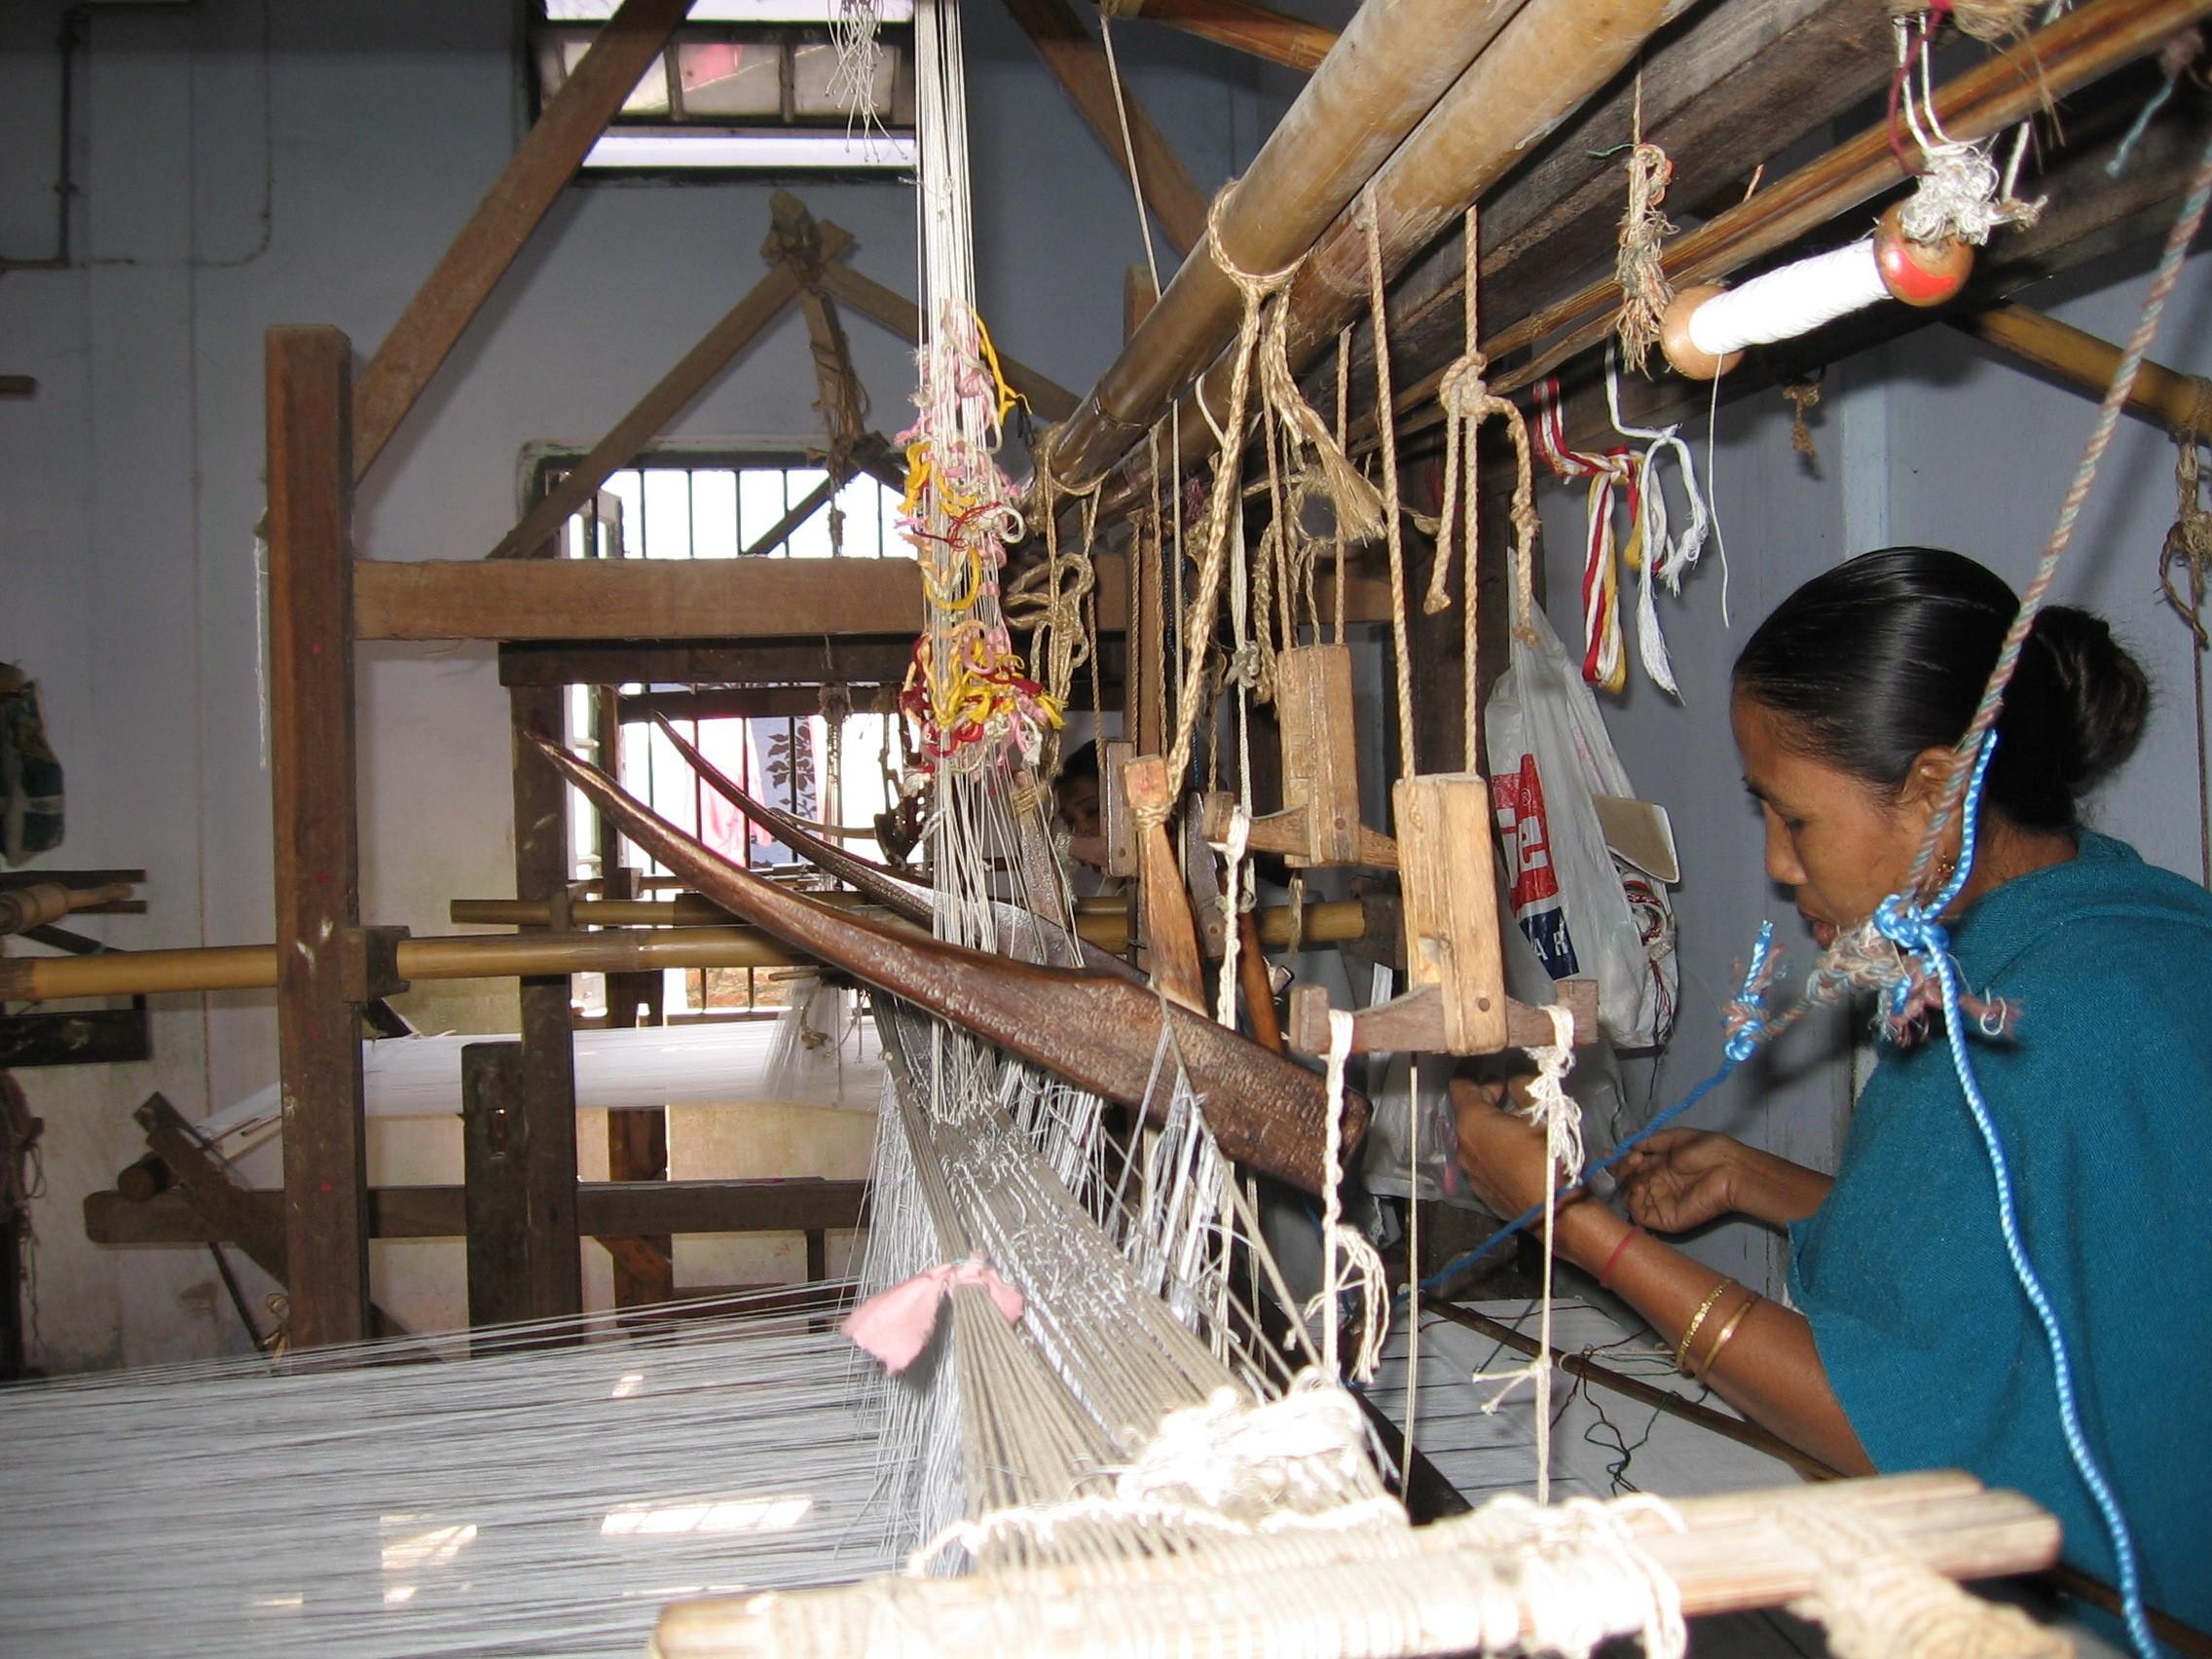 hindu singles in carrier mills 1000s of singles hookup, dating or long term live in west paducah meet someone now   carrier mills women dallasania women mitchellsville women gleason women.